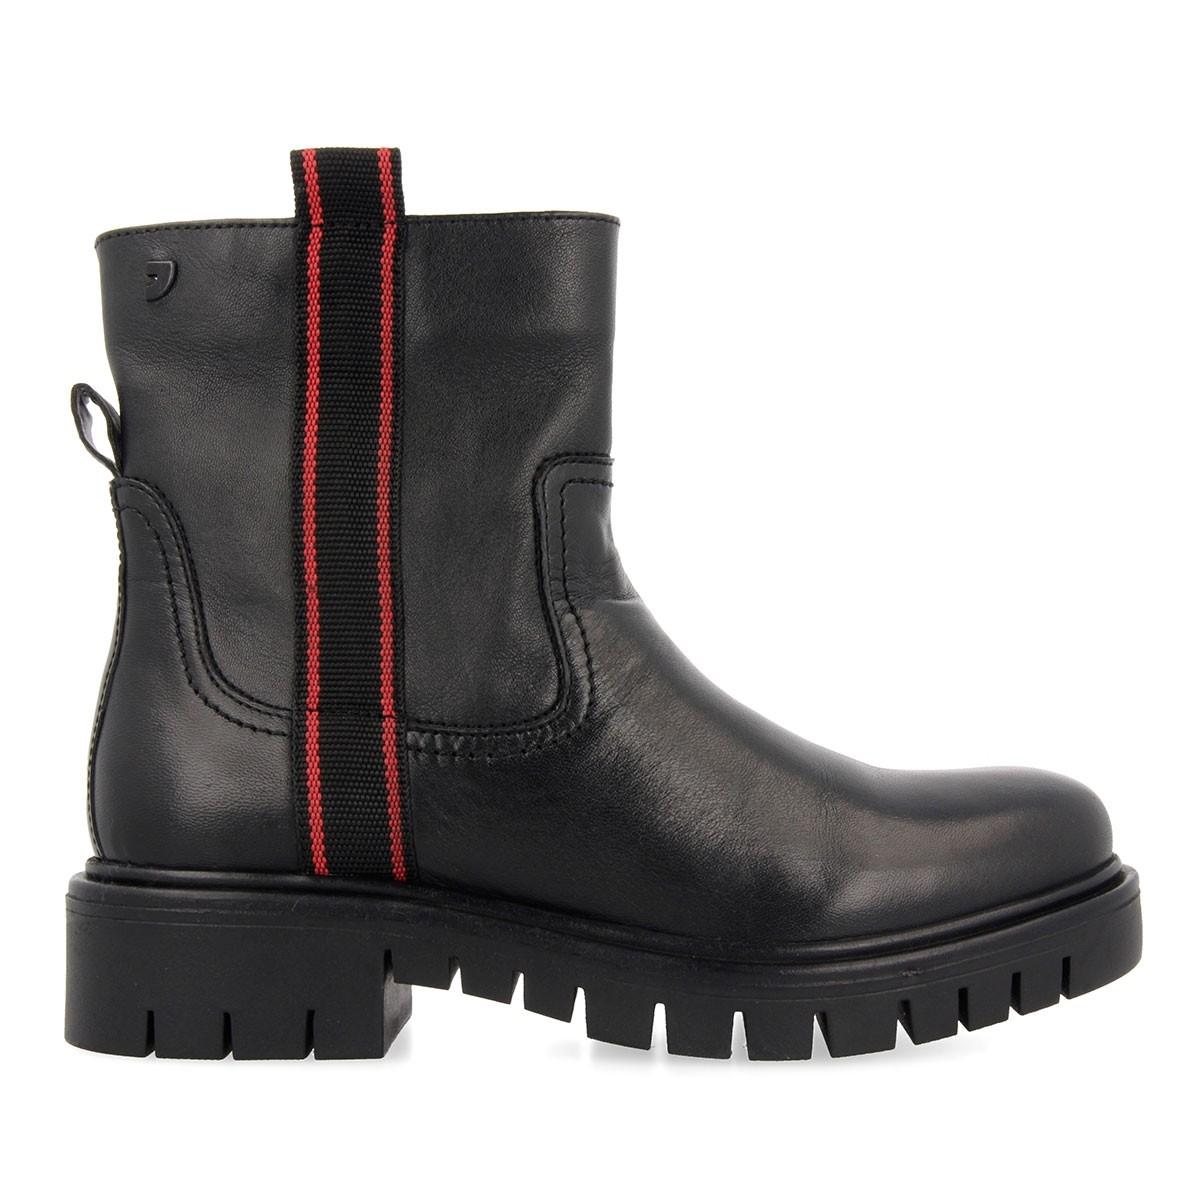 56554 Black BOOTS 1